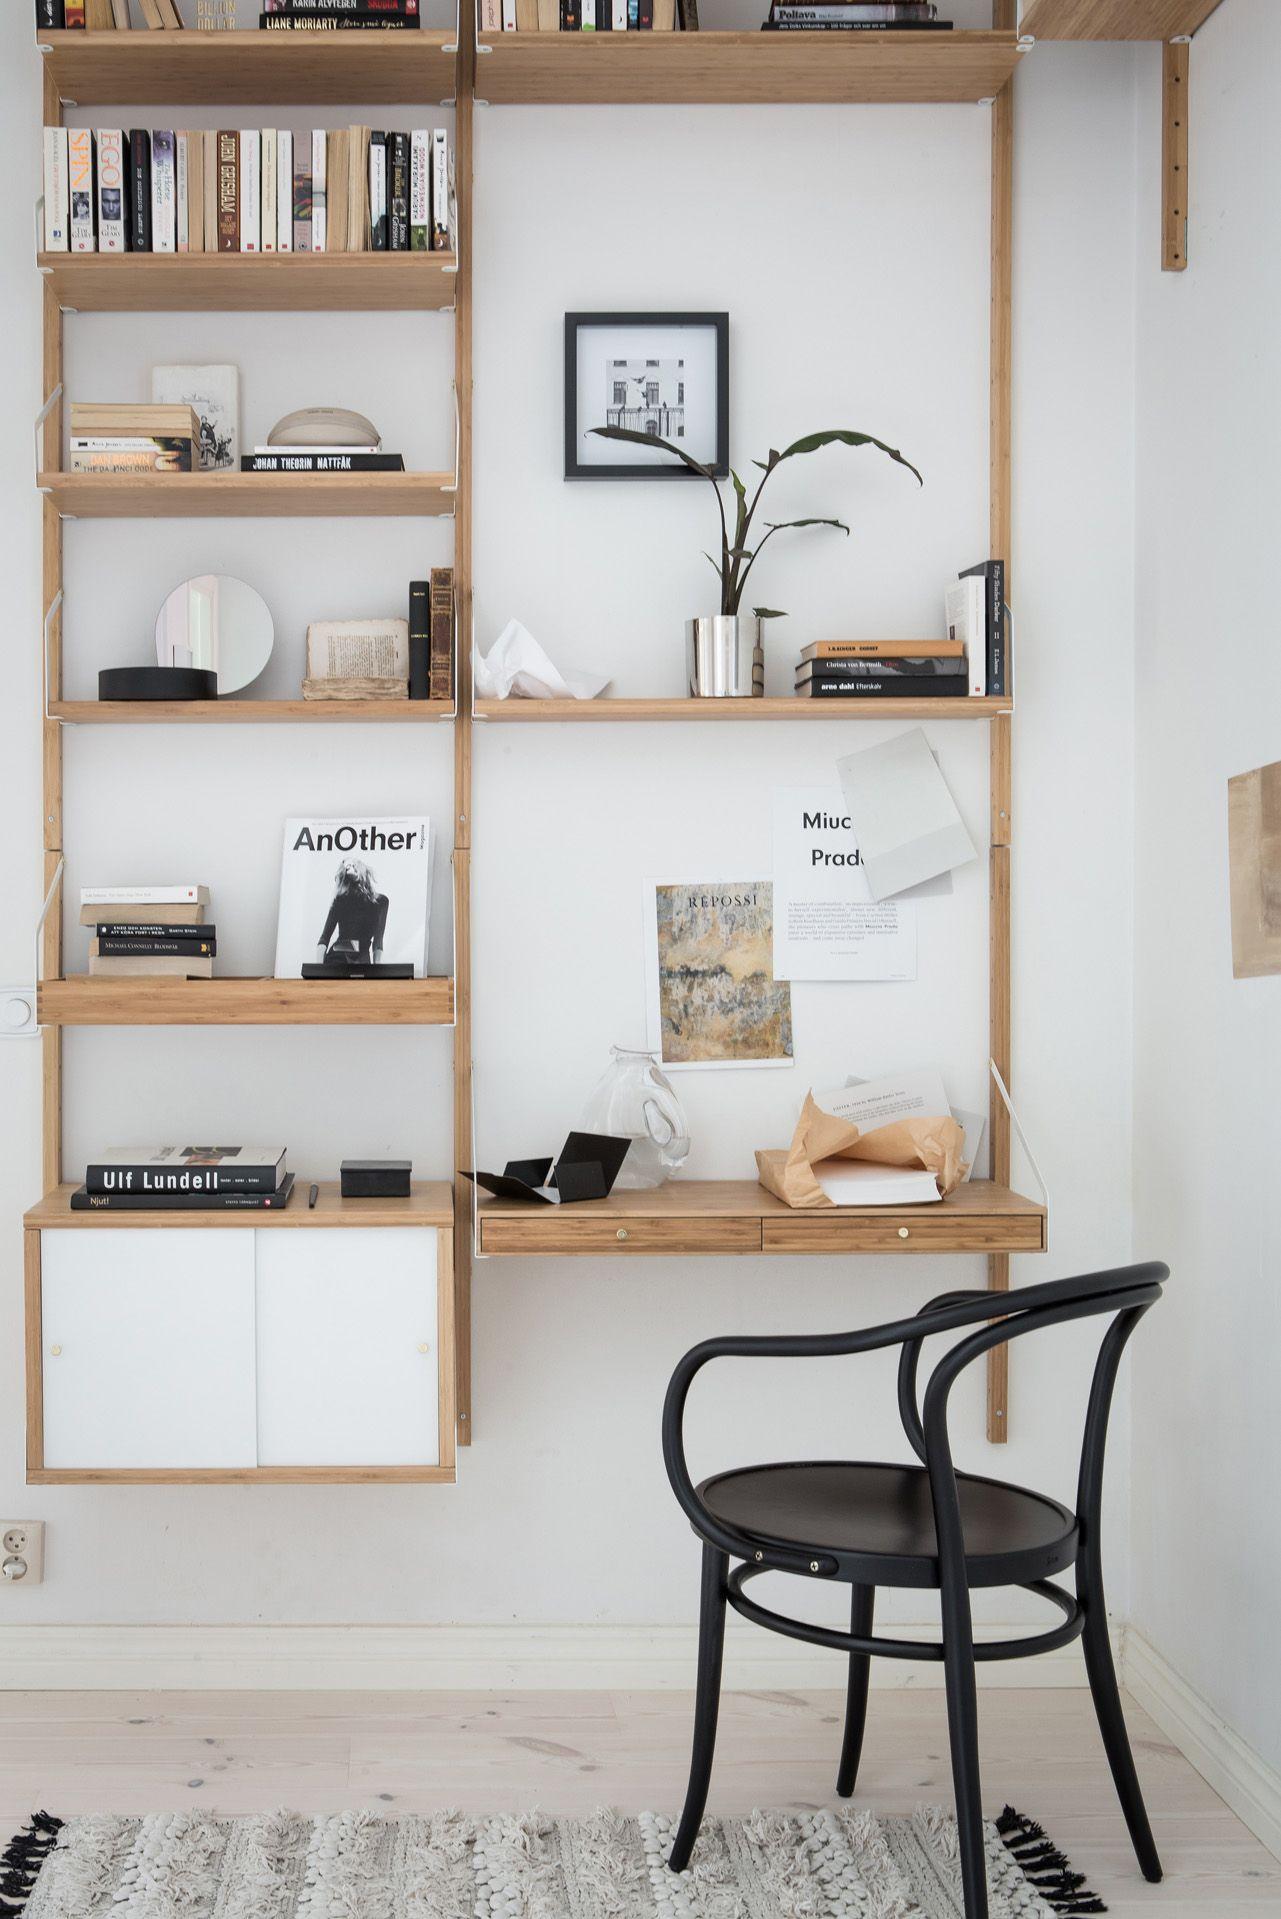 Andra Langgatan 4 B Ikea Interior Home Office Design Home Office Decor